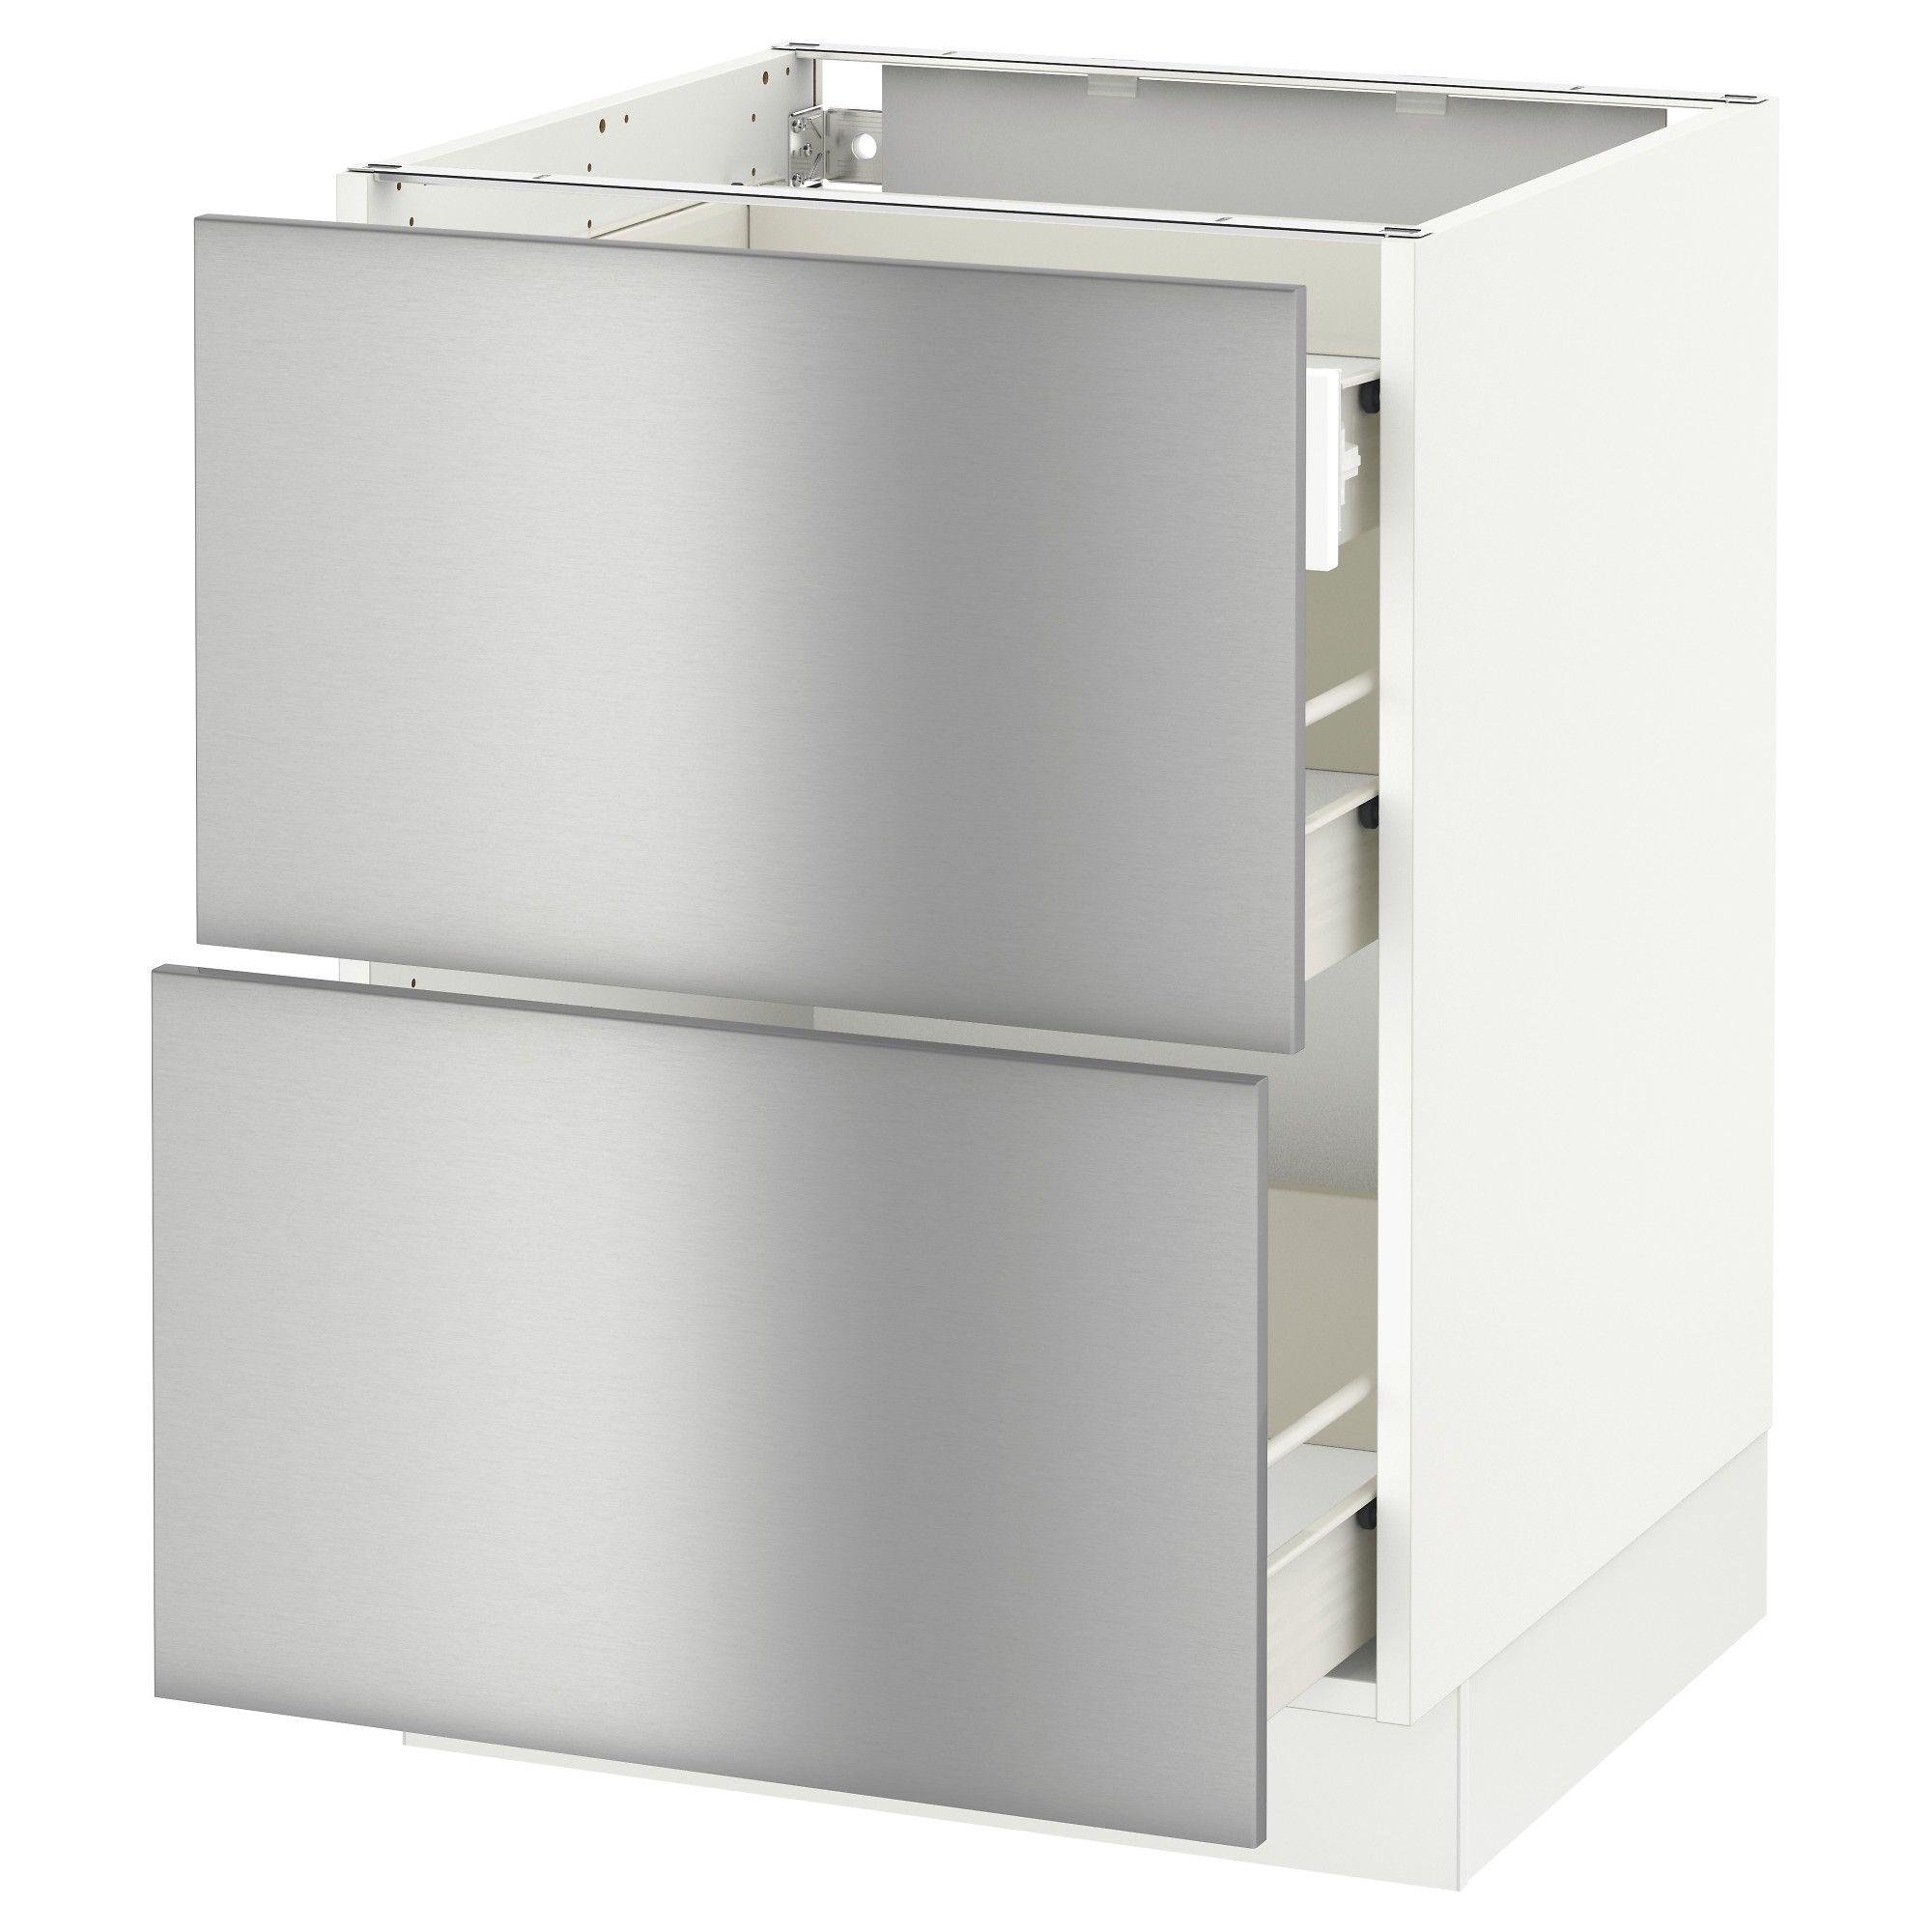 Ikea Sektion Blanc Arm Inf 2 Faces3 Tiroirs Frame Colour